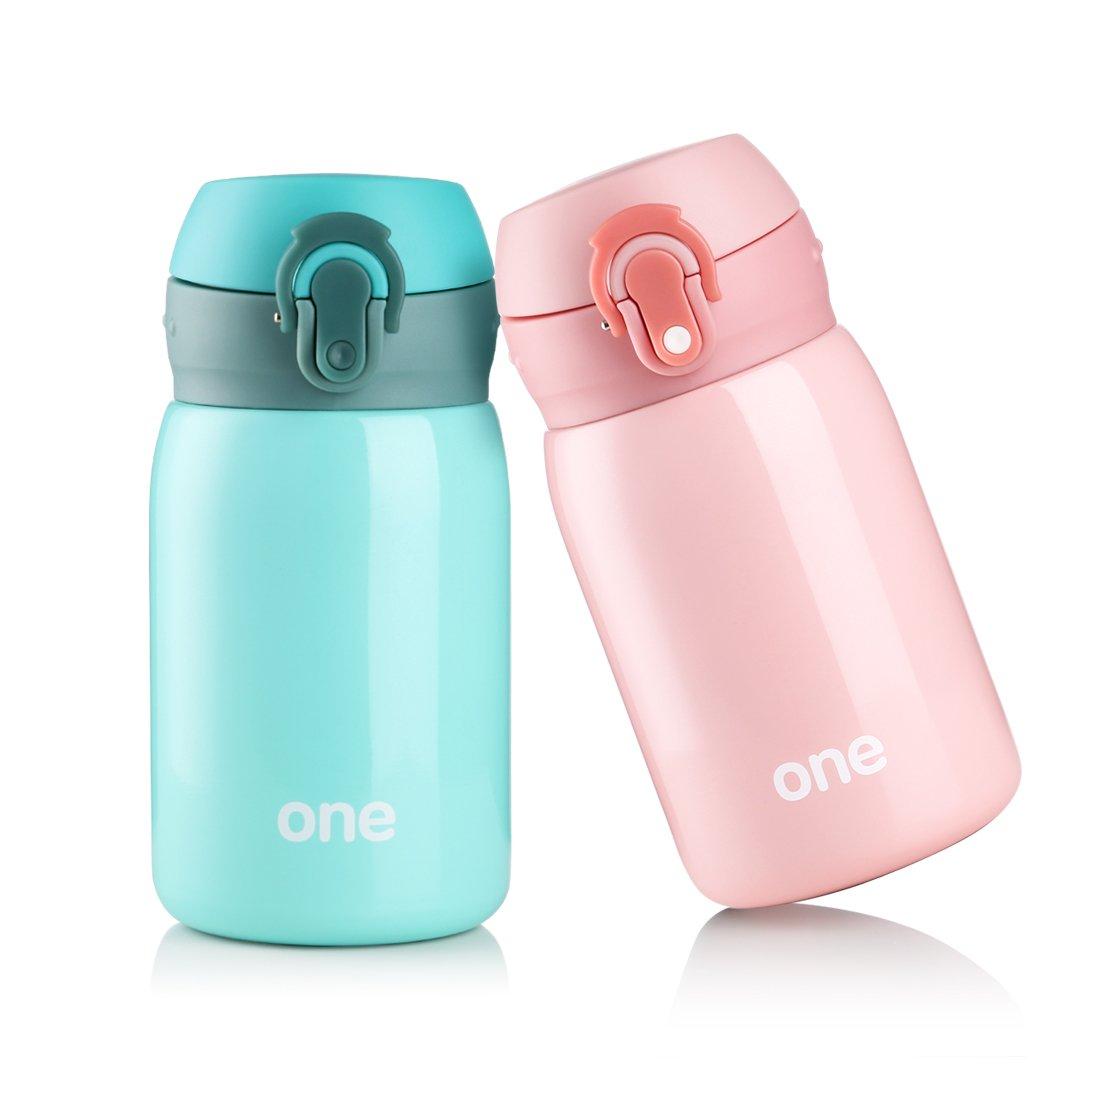 Kid&Girls 260ml/9oz Mini Insulated Water Bottle Drink Thermos Cute Stainless Steel Vacuum Flask,Leak-proof Travel Mug Coffee Tumbler (Green) by HOLD U FUN (Image #8)